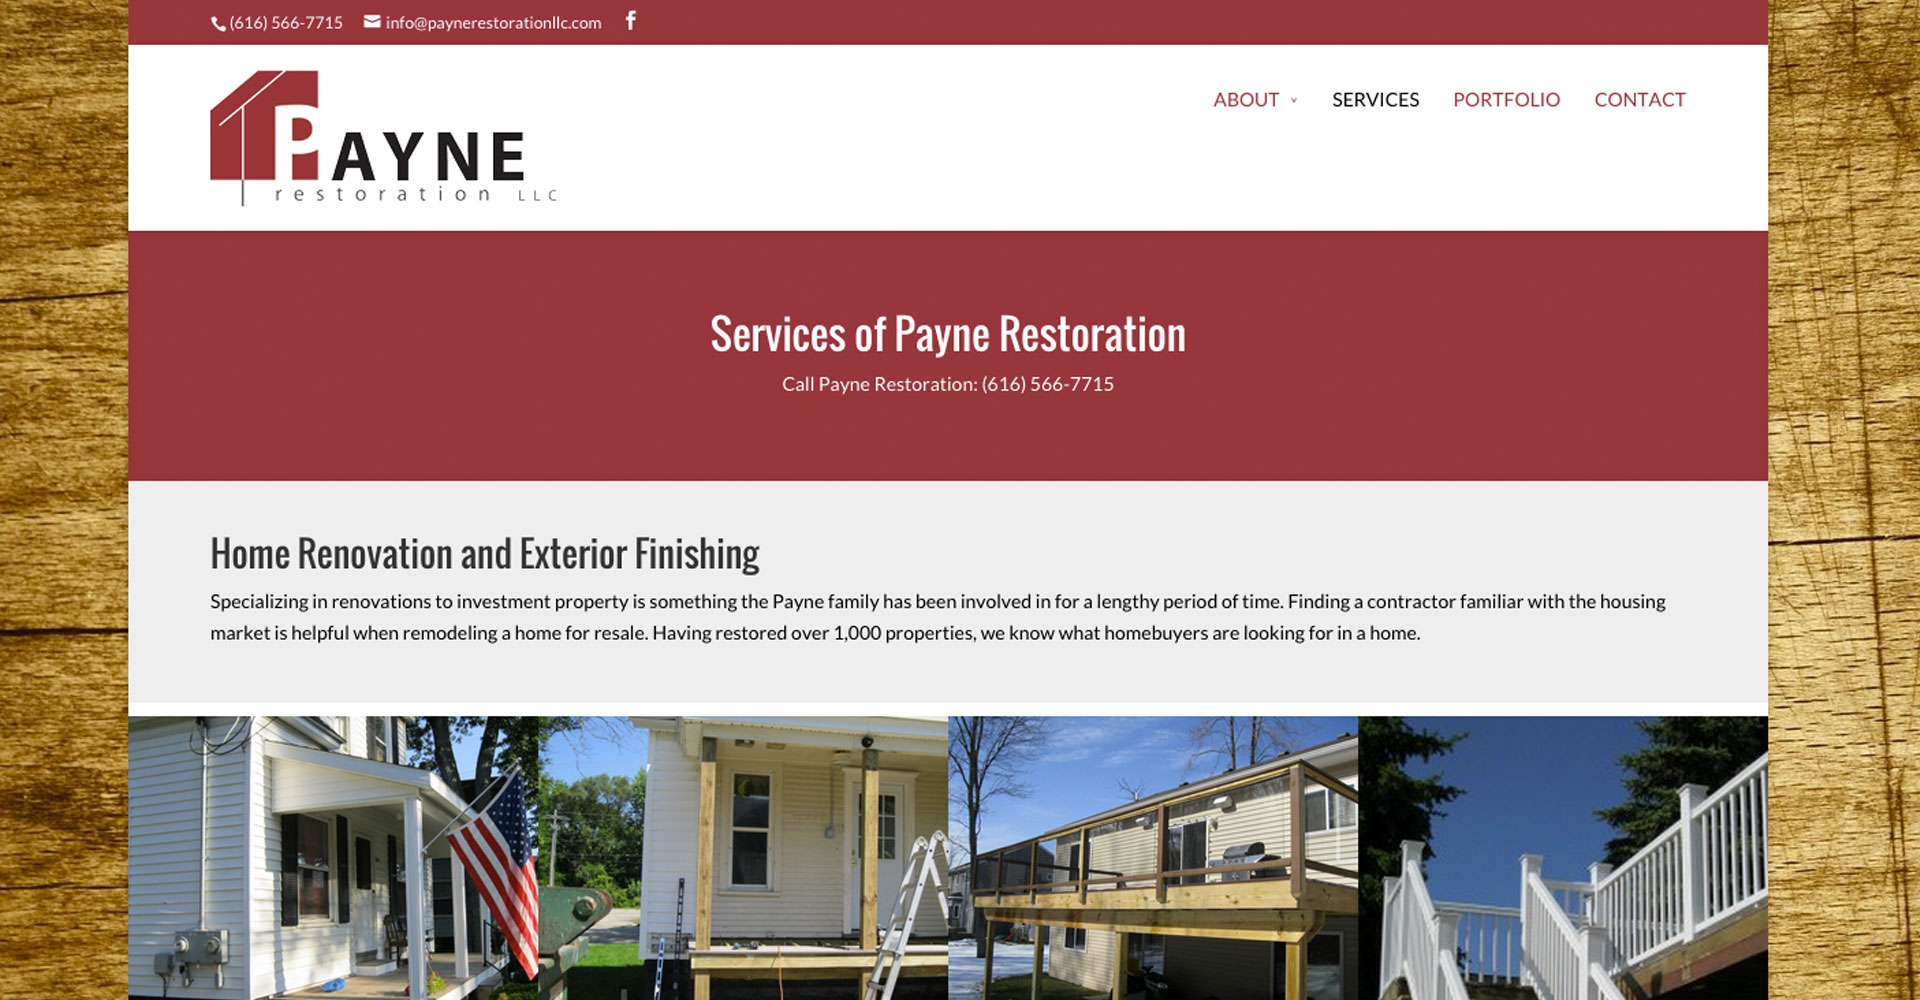 payne-resto-services